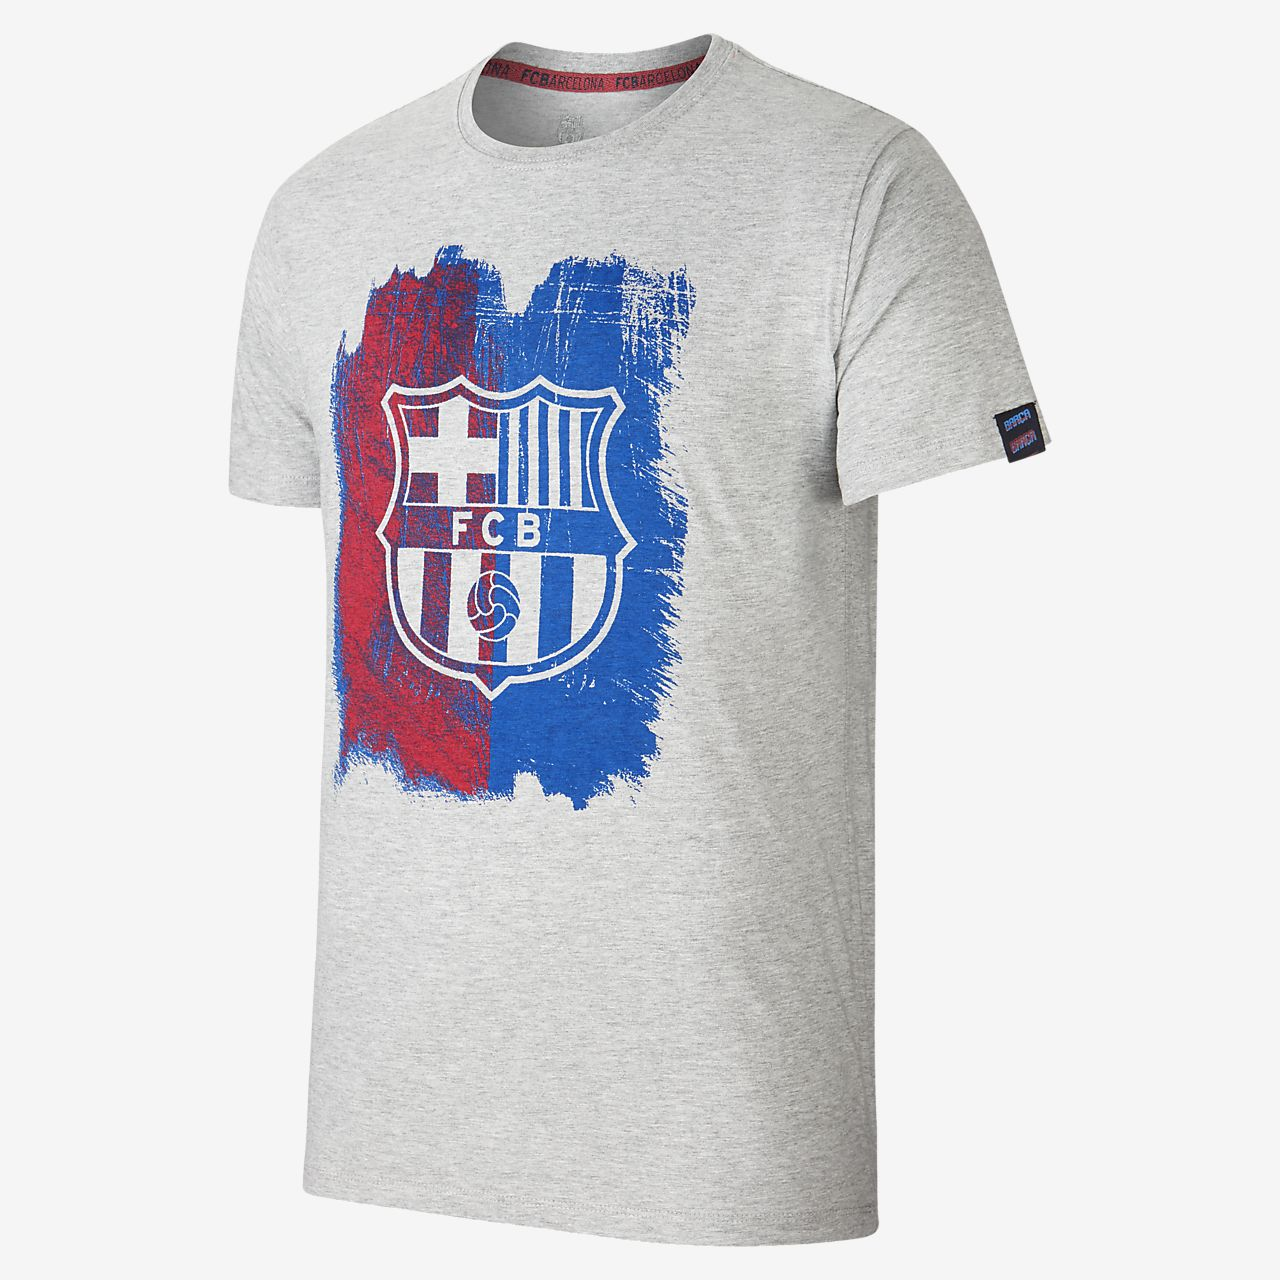 FC Barcelona Painted Herren T Shirt